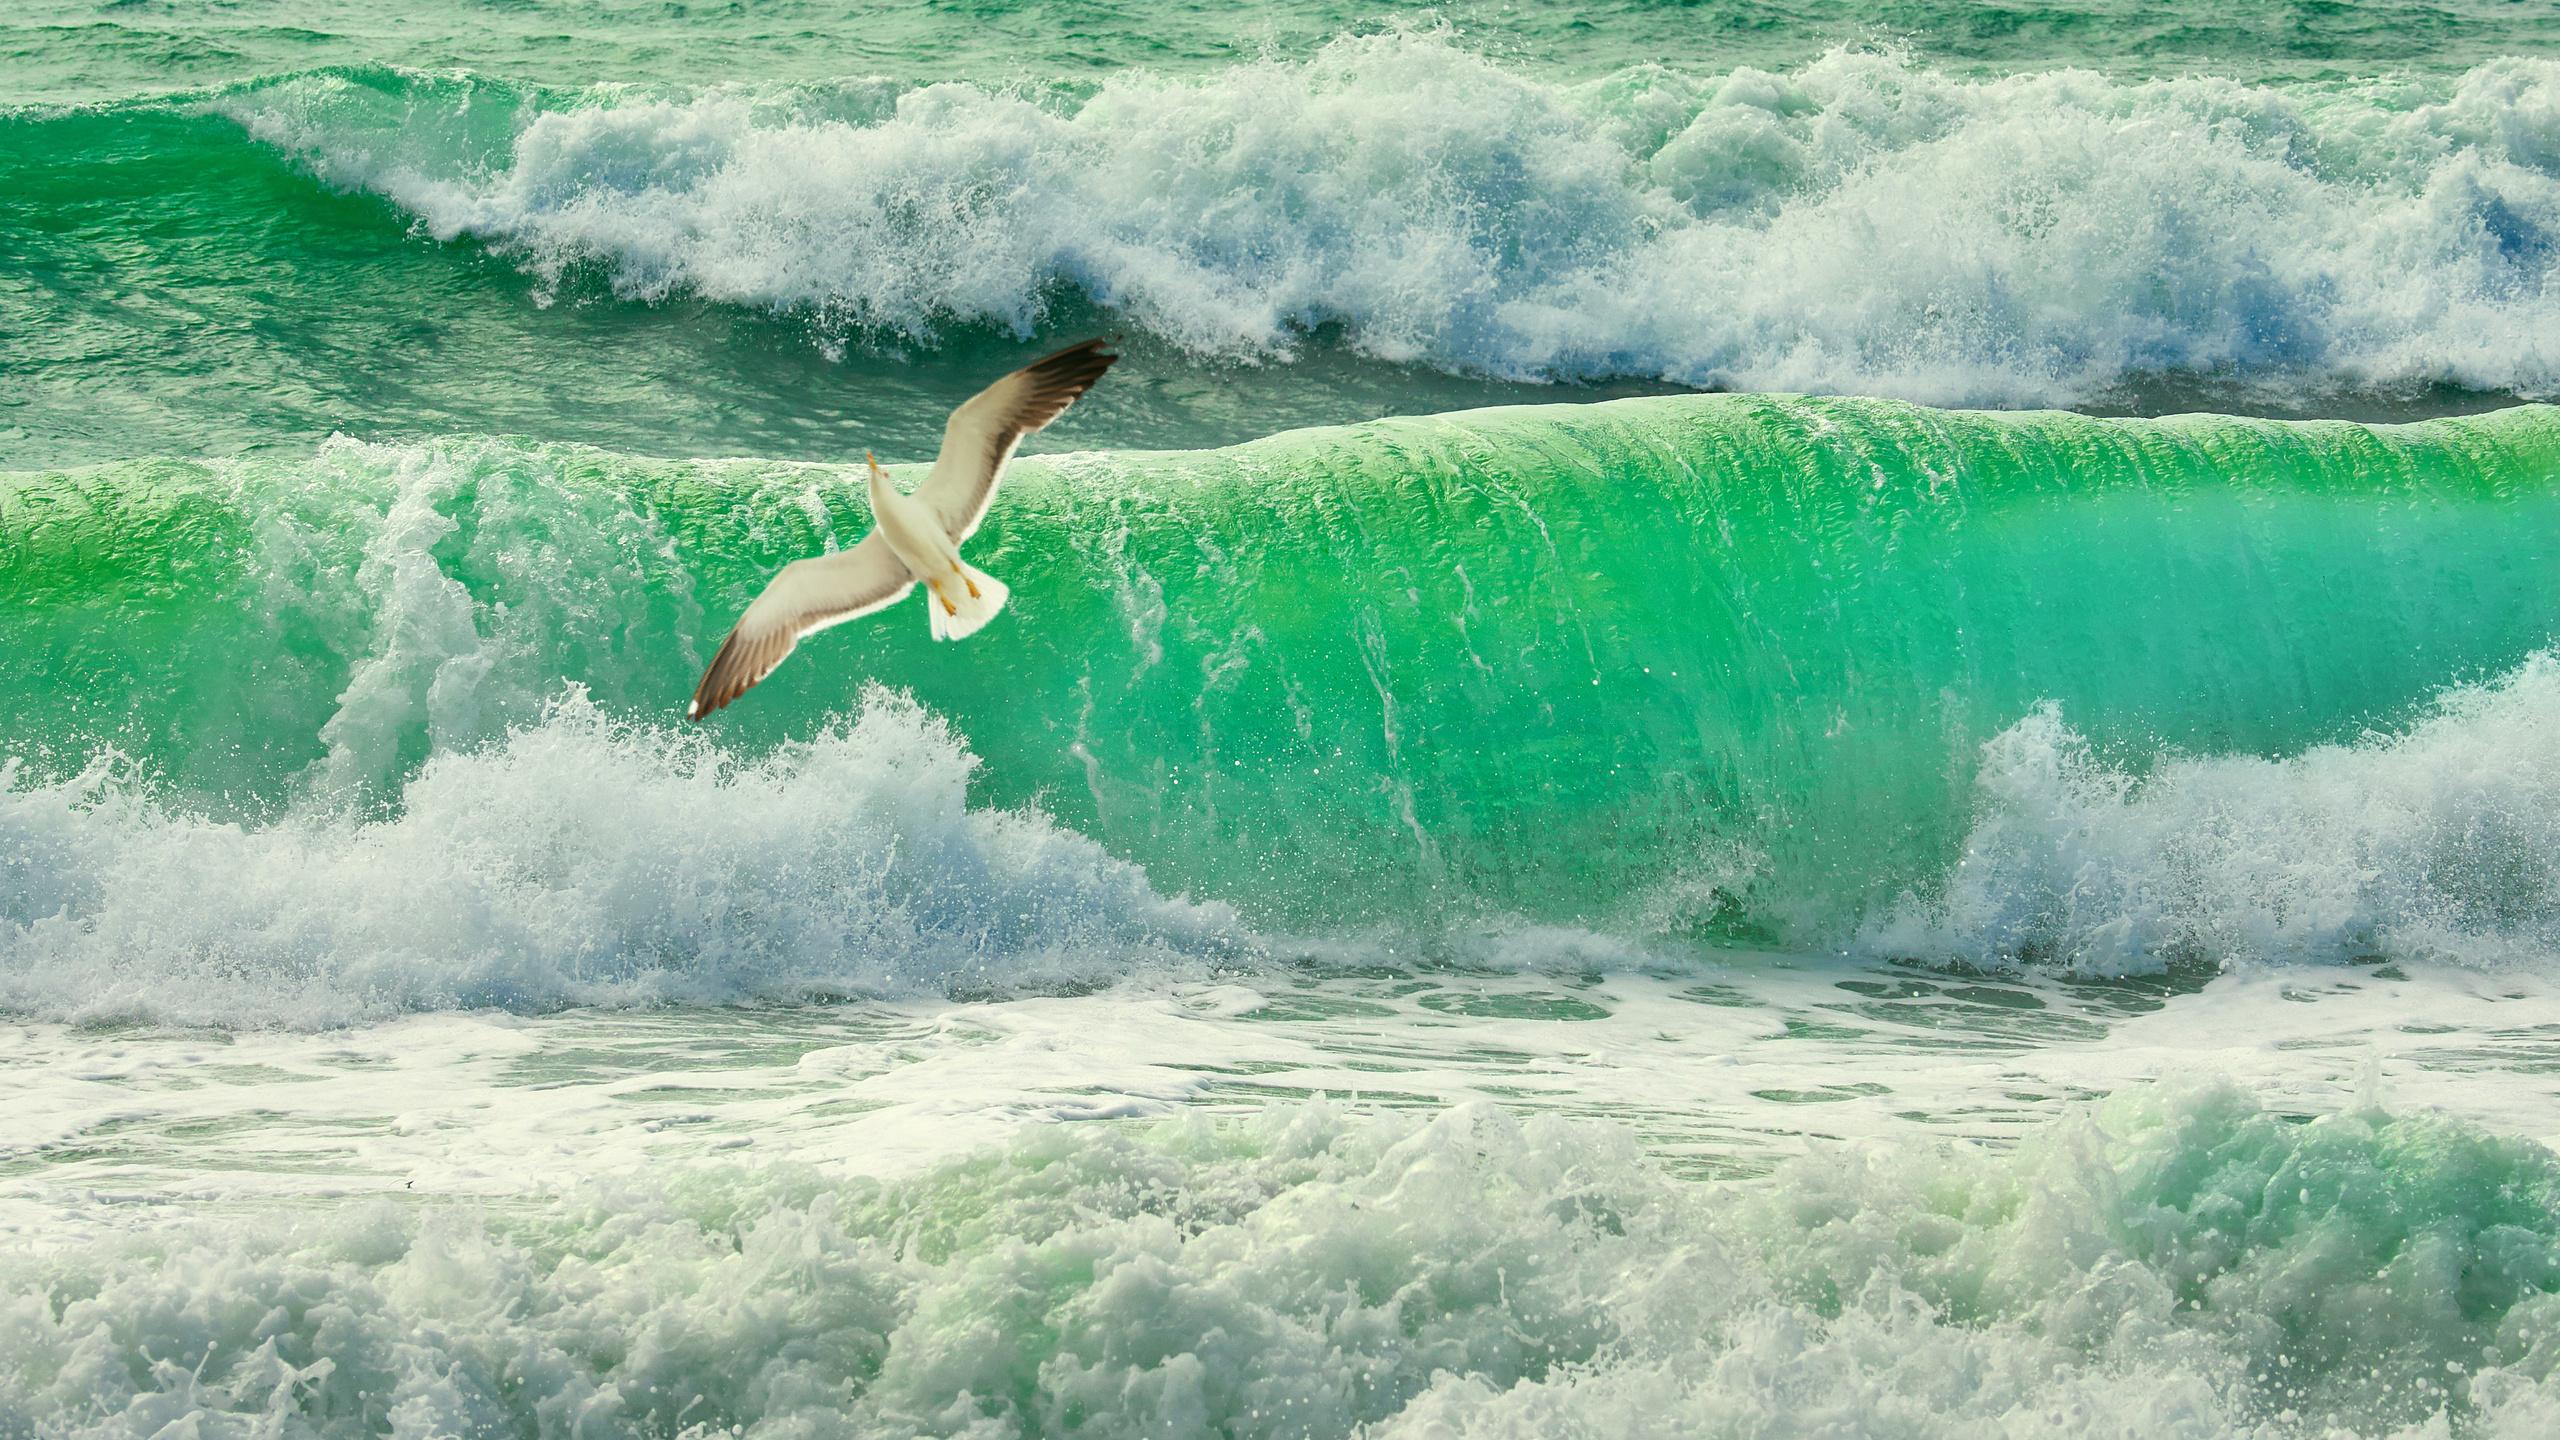 океан, шторм, прибой